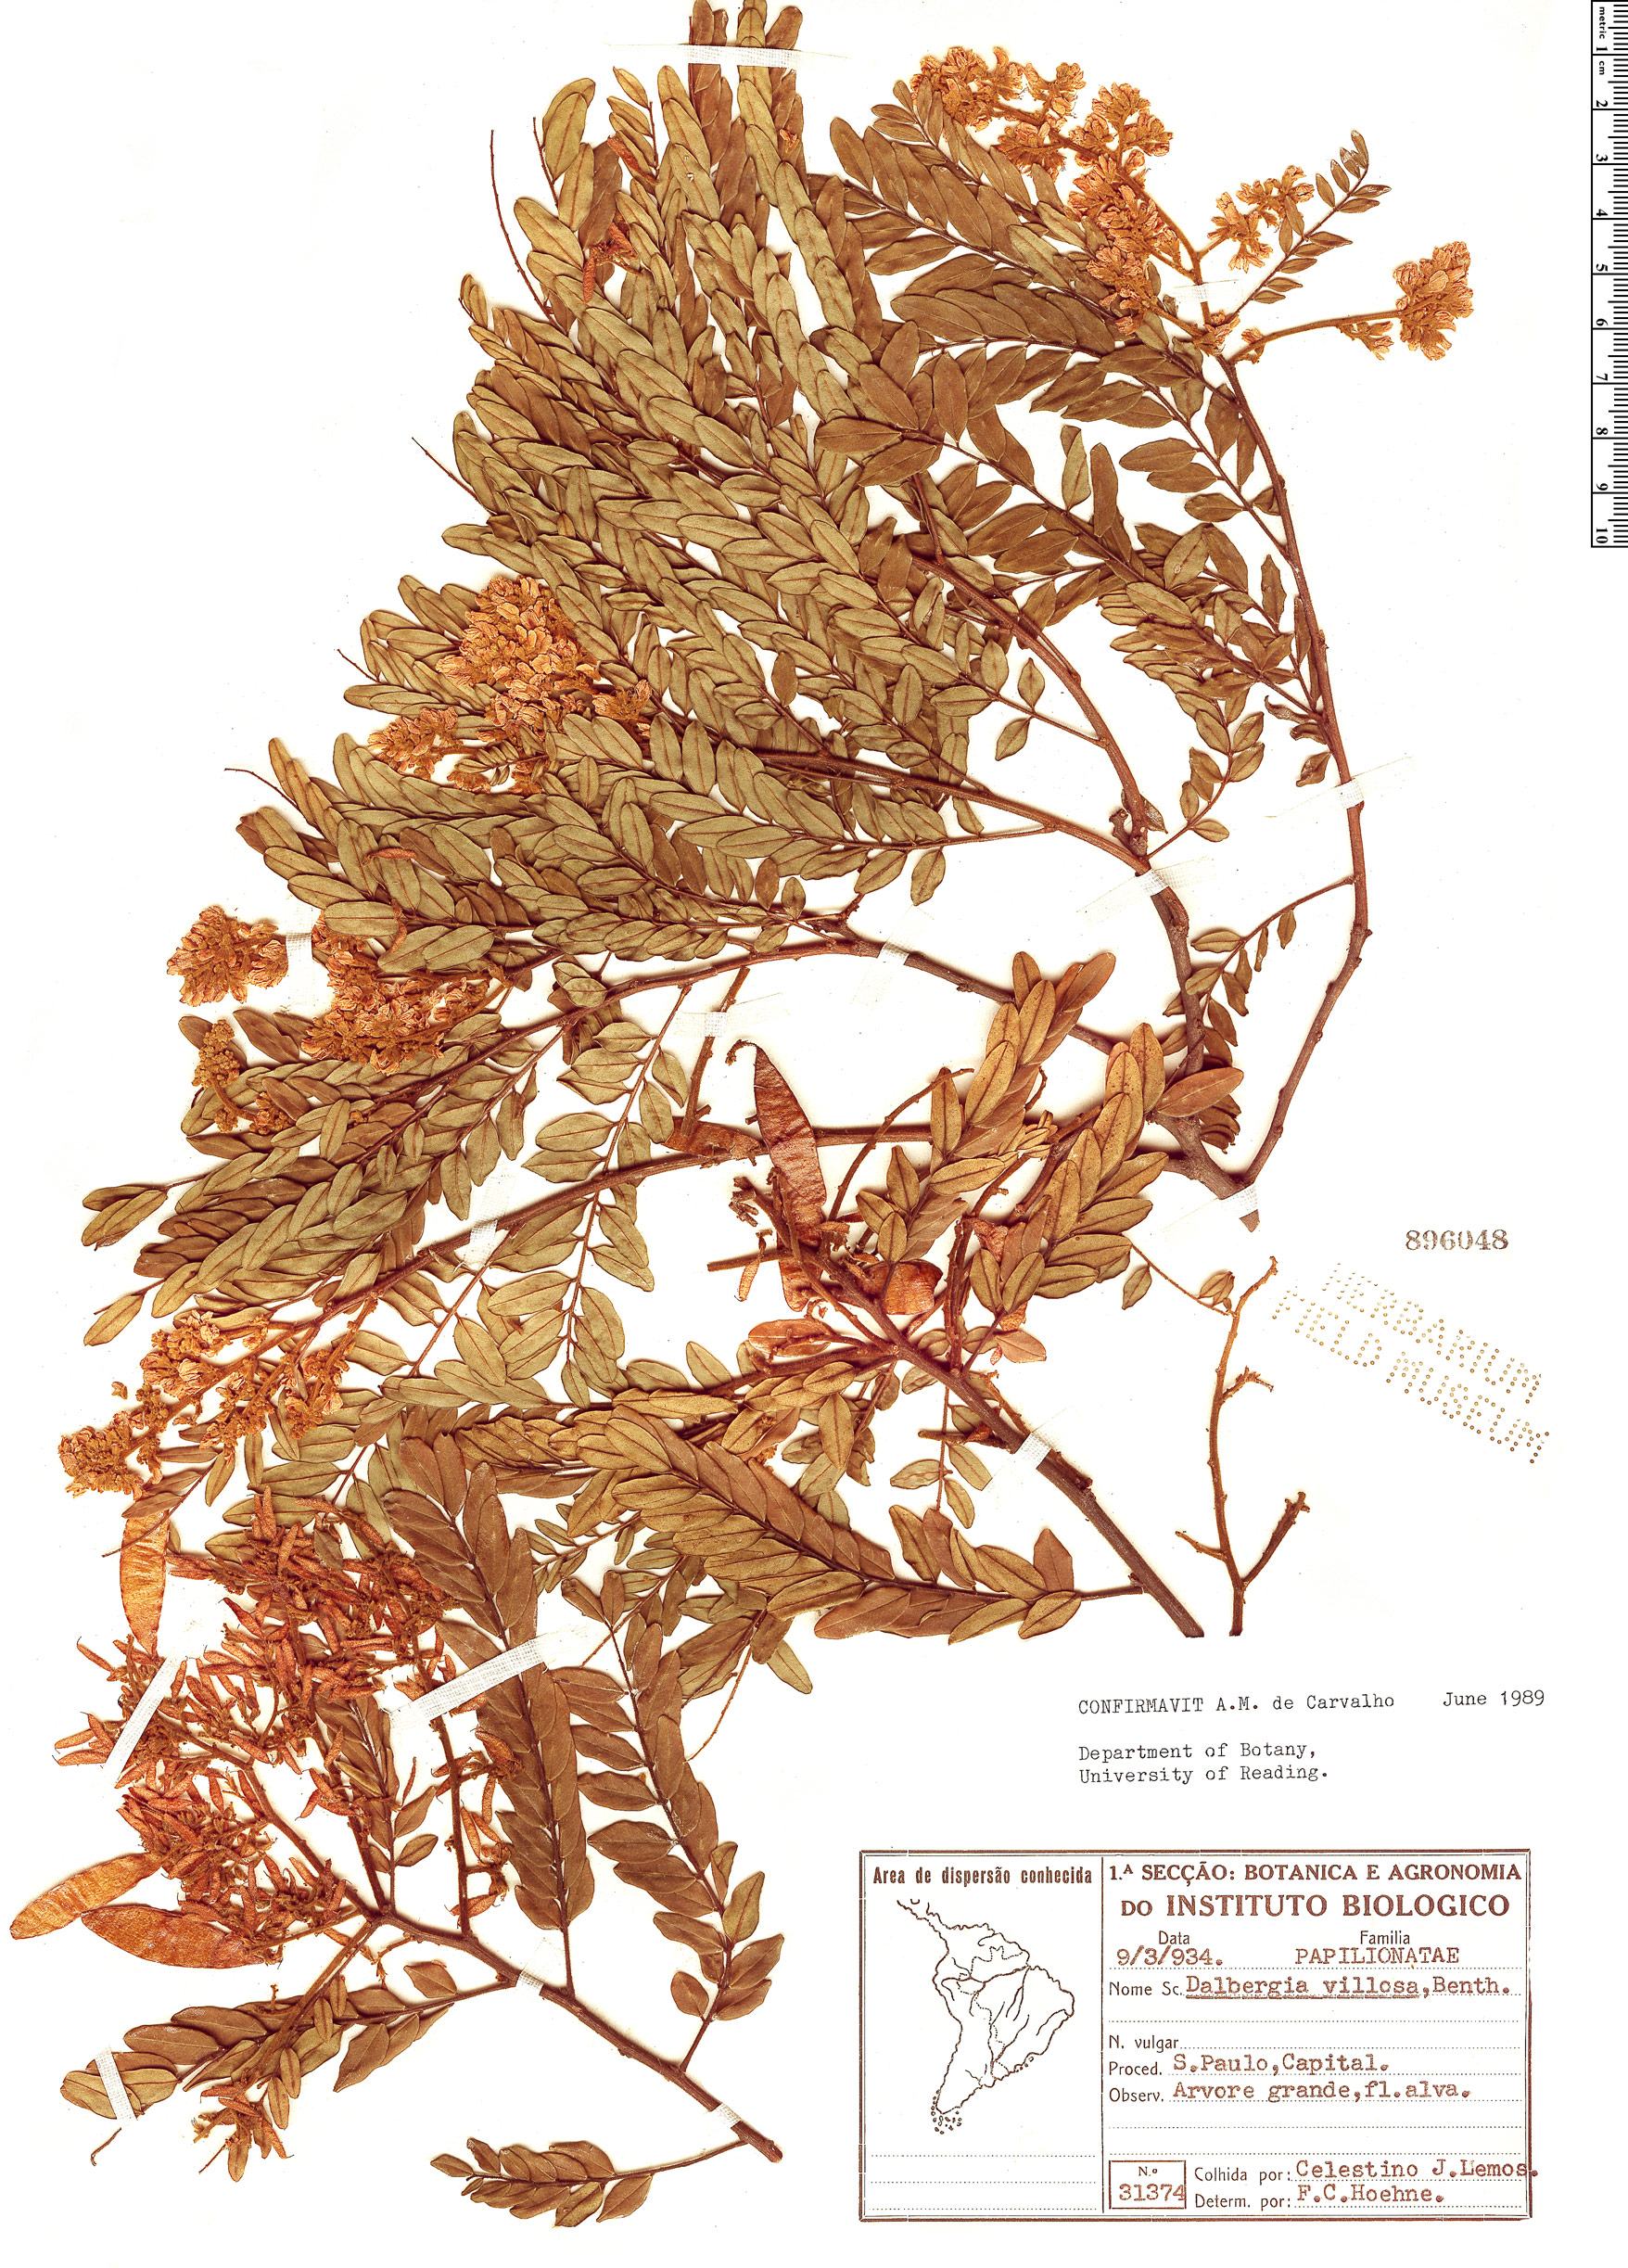 Specimen: Dalbergia villosa